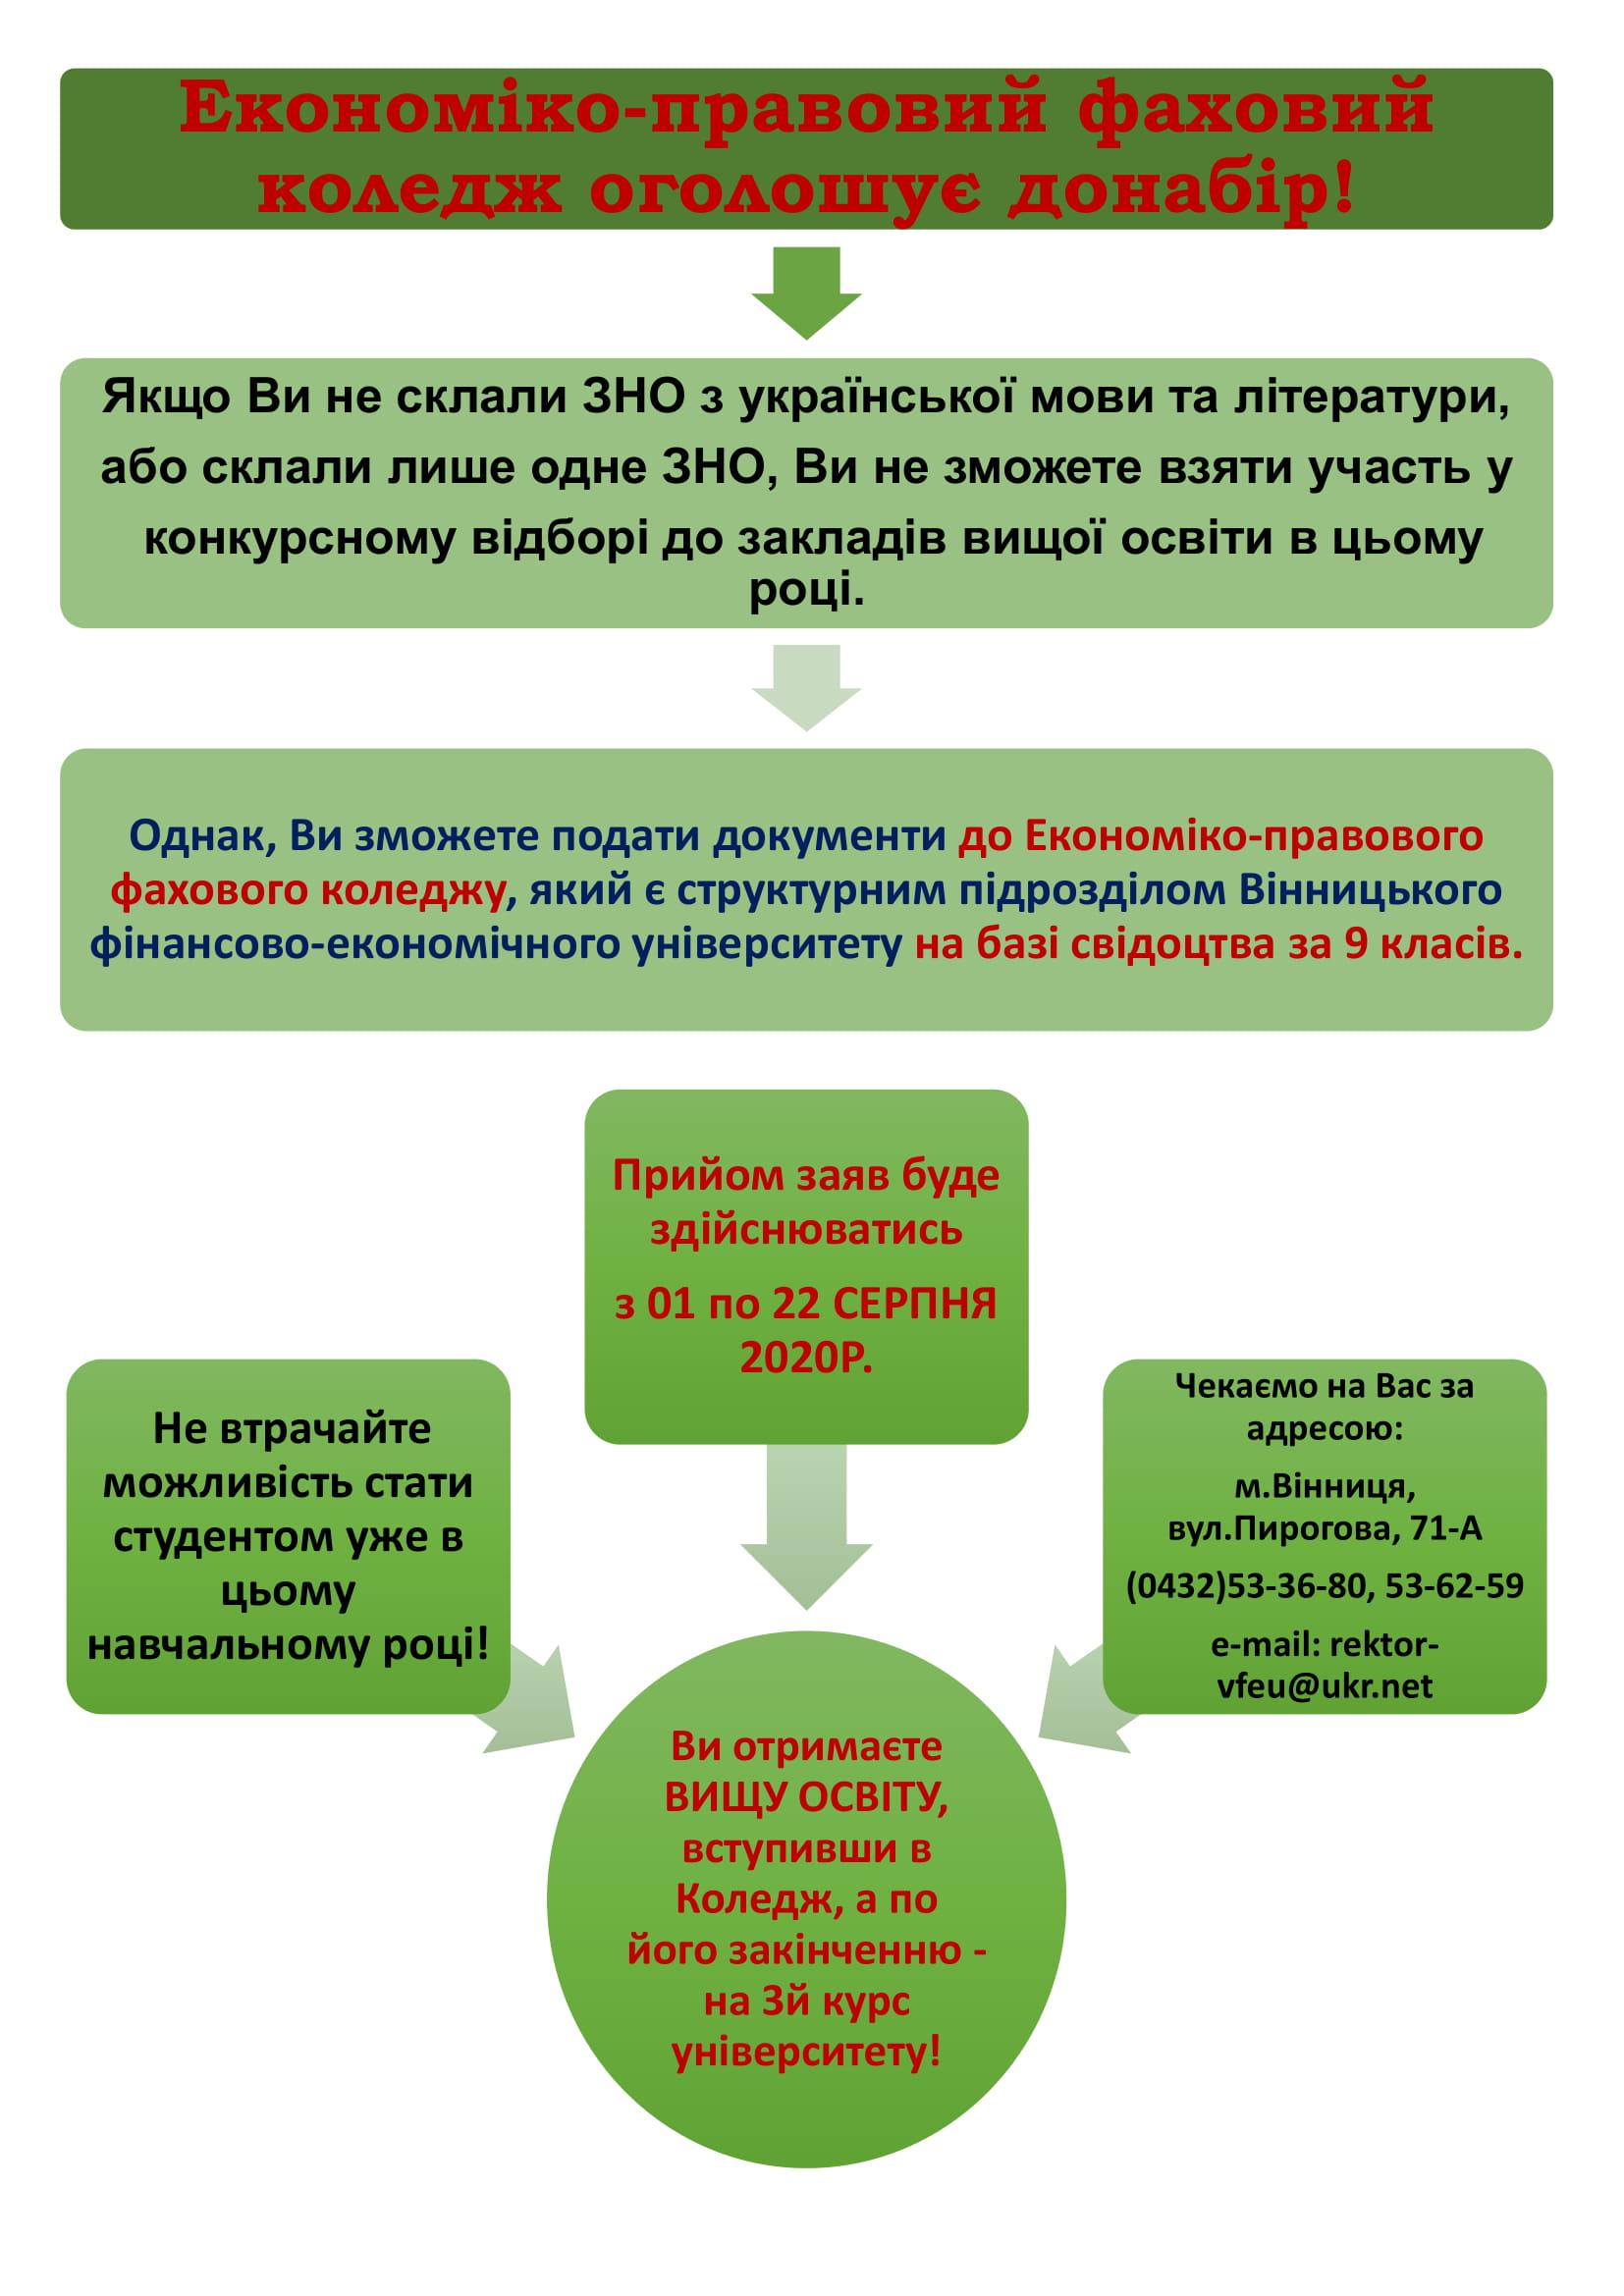 donabor_9_kl-konvertirovan_2-1.jpg (295.47 Kb)